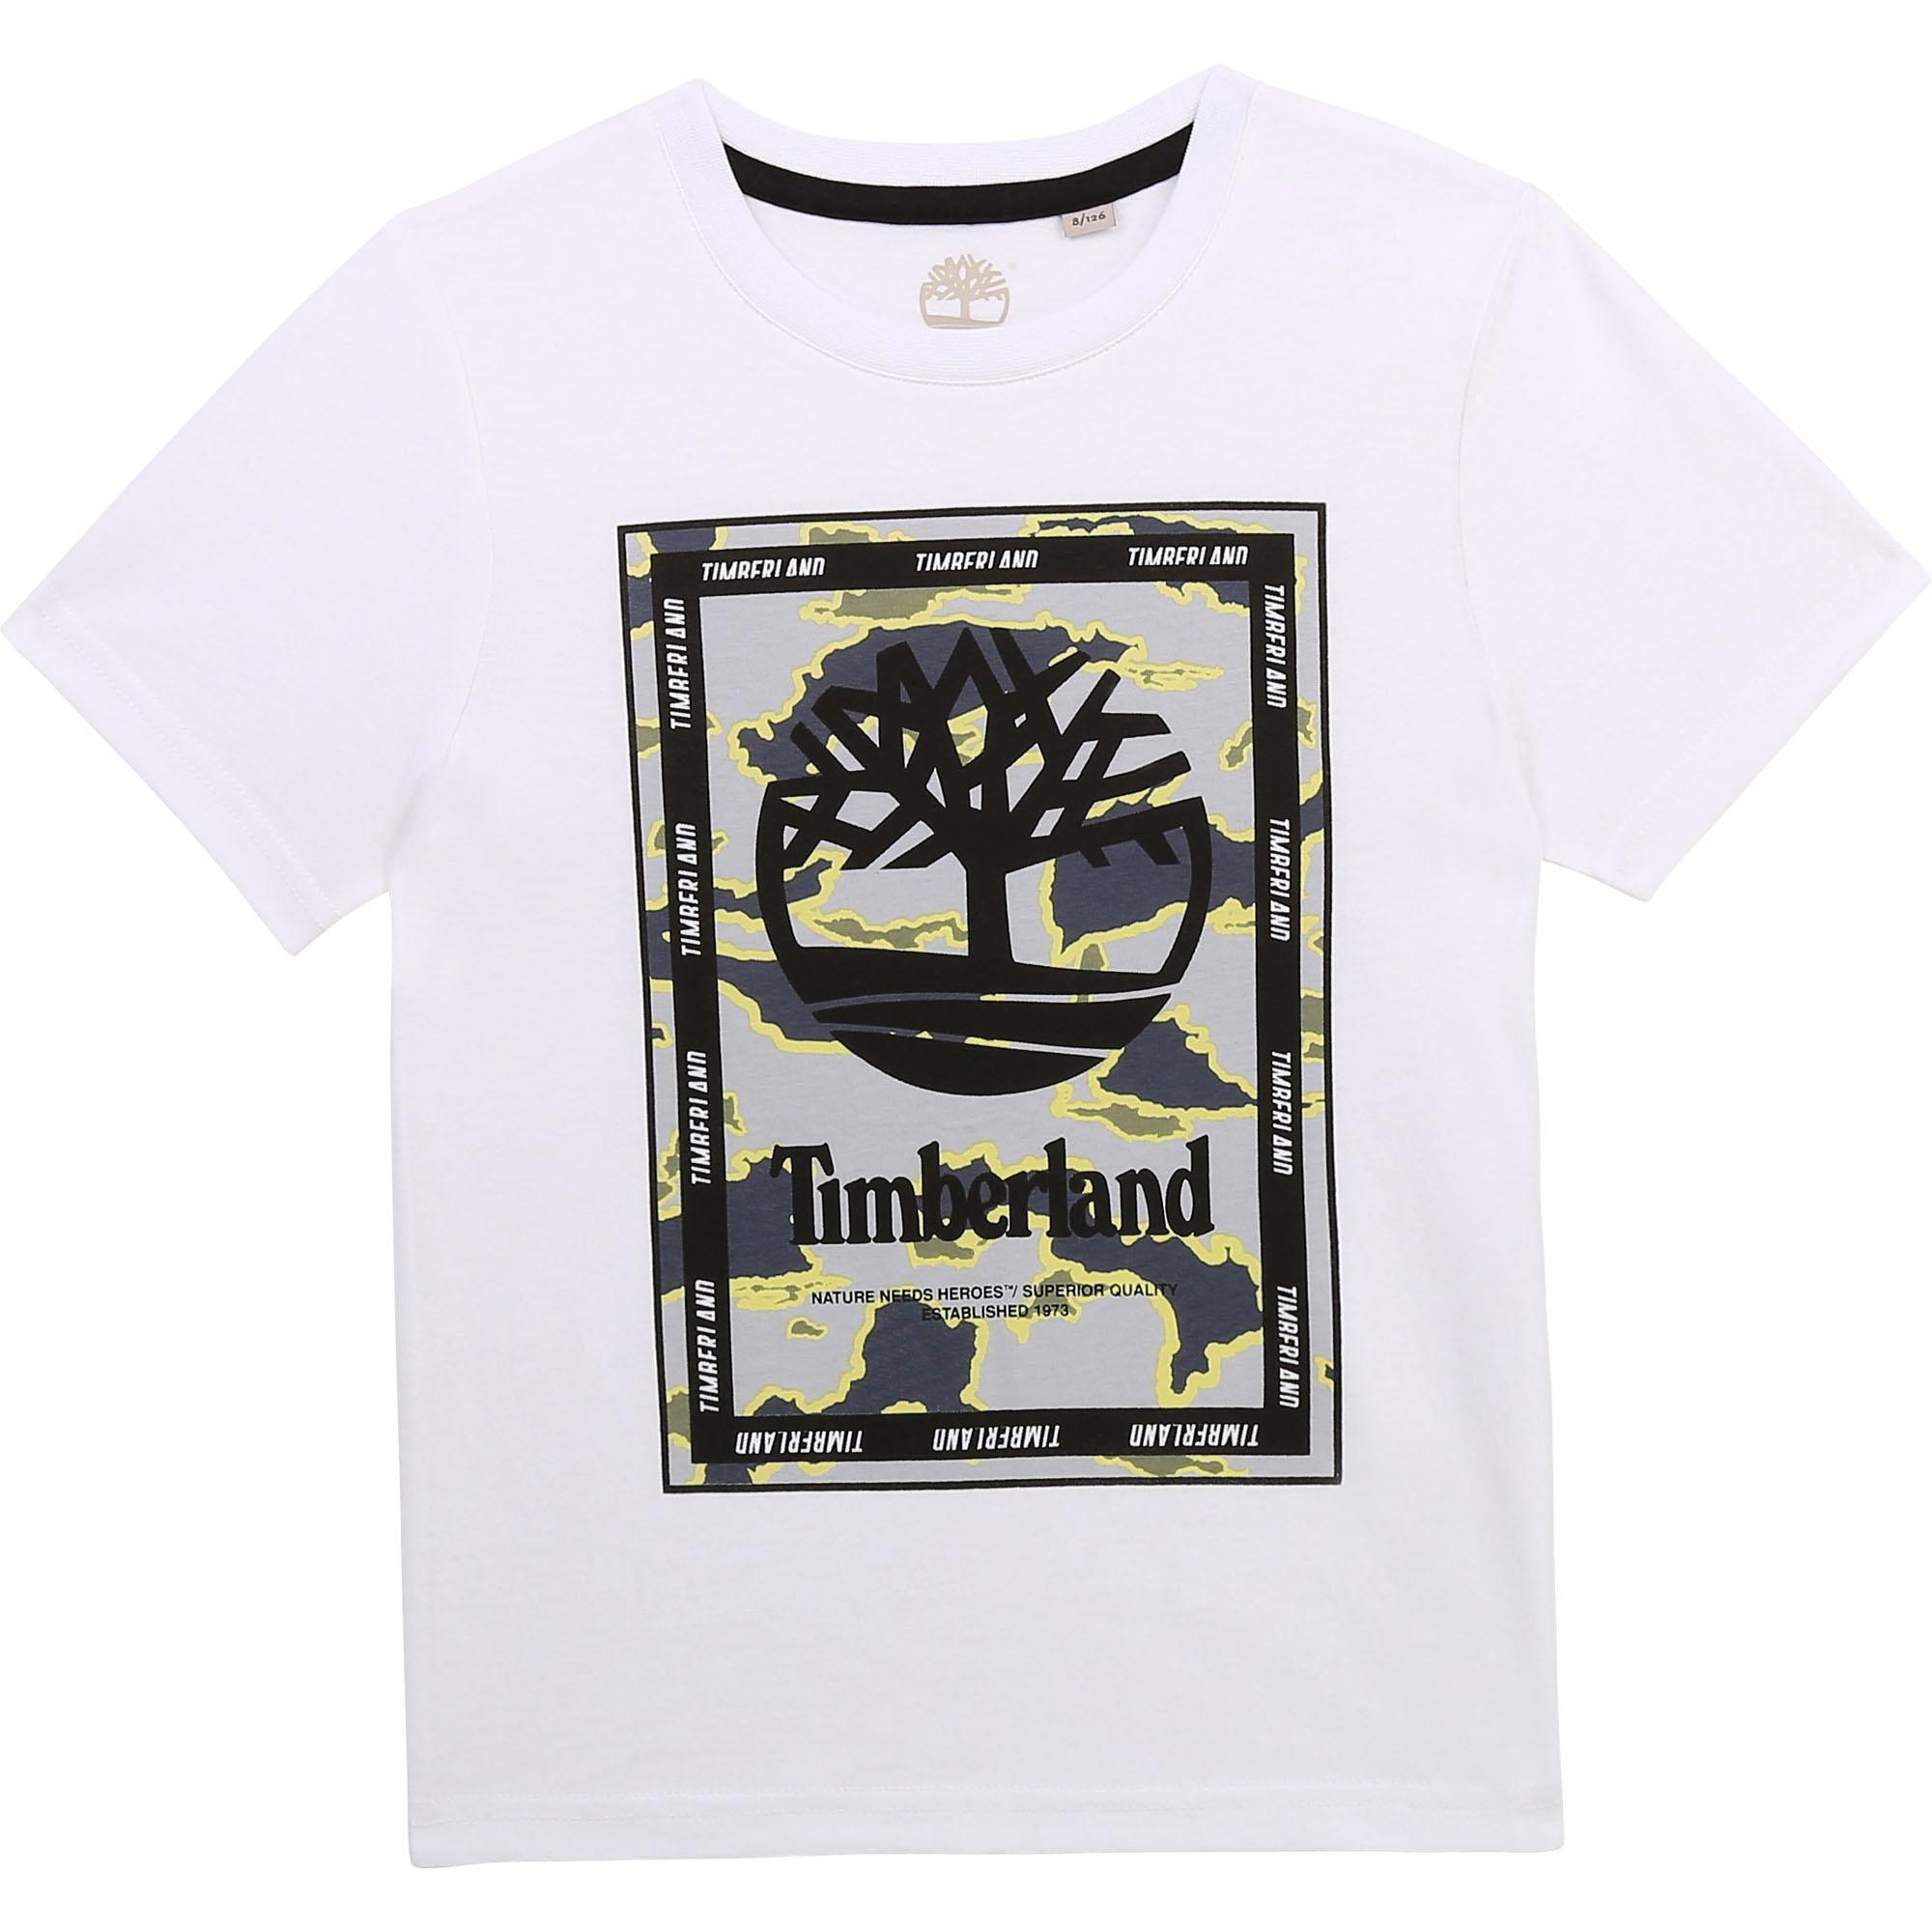 TIMBERLAND t-shirt-1